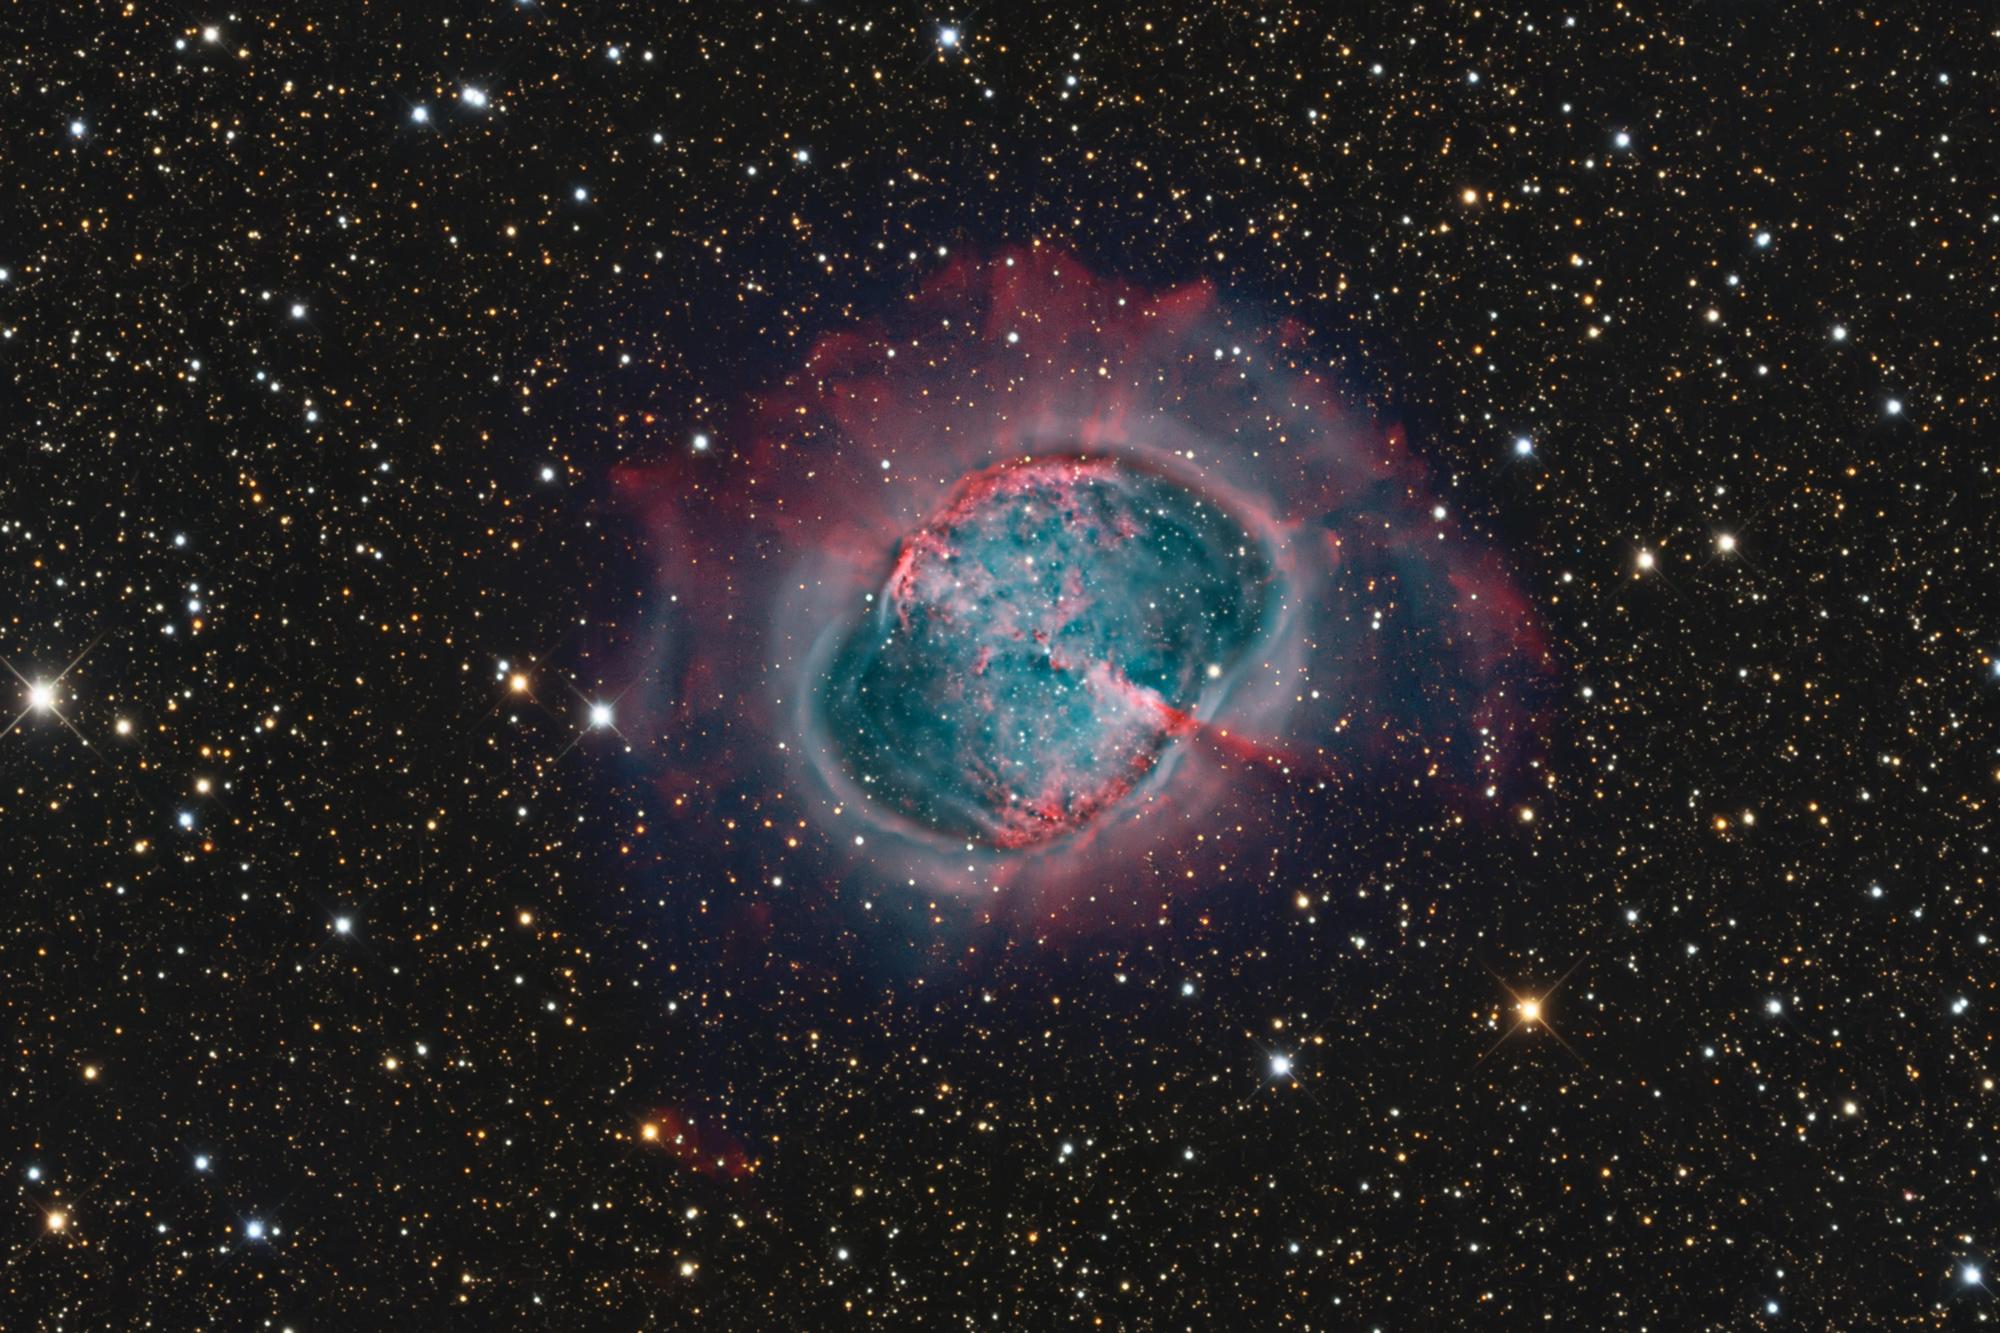 nasa comet tracking - HD1920×1279